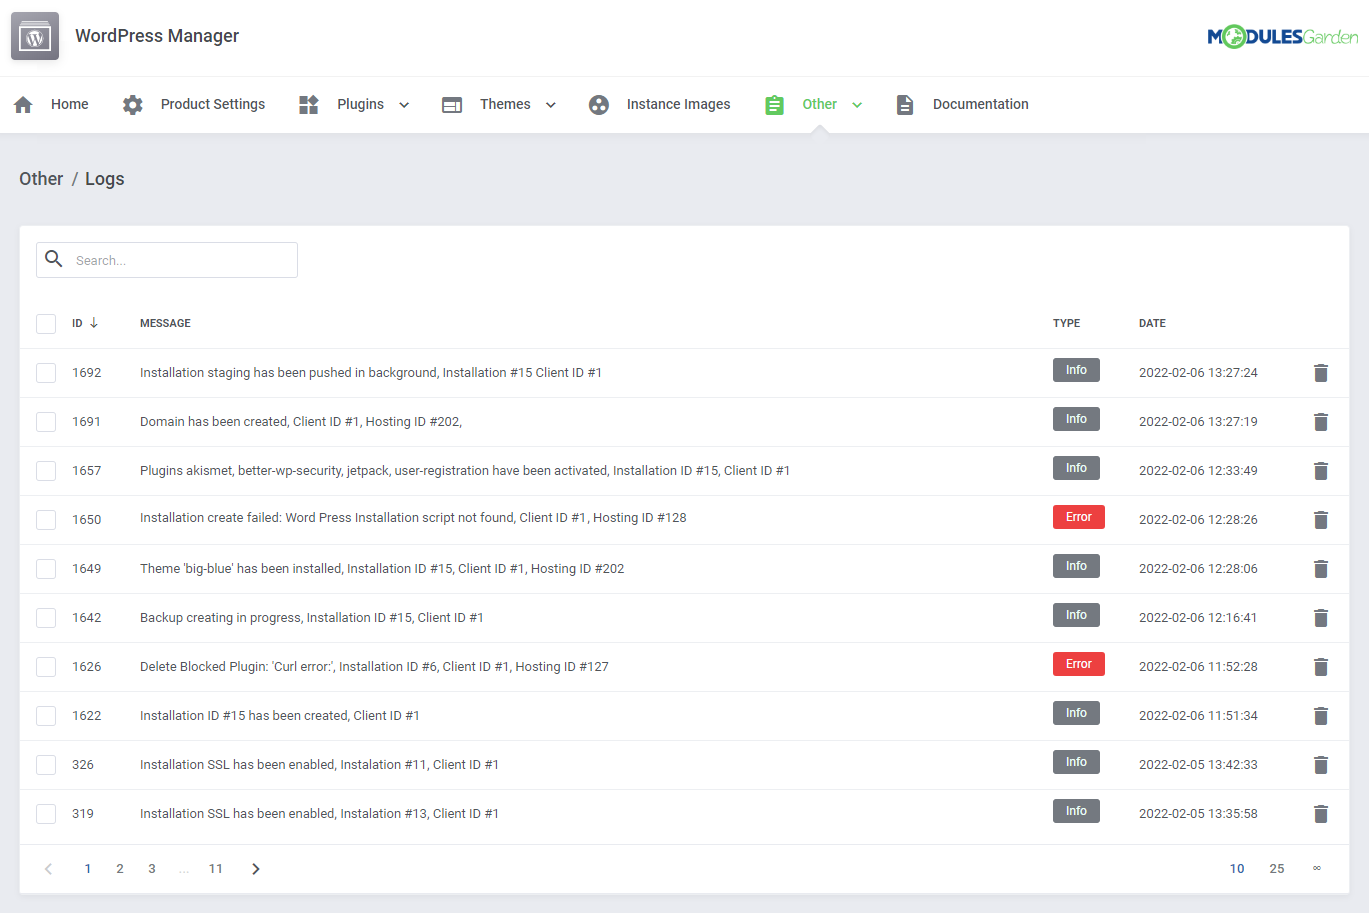 WordPress Manager For WHMCS: Module Screenshot 41